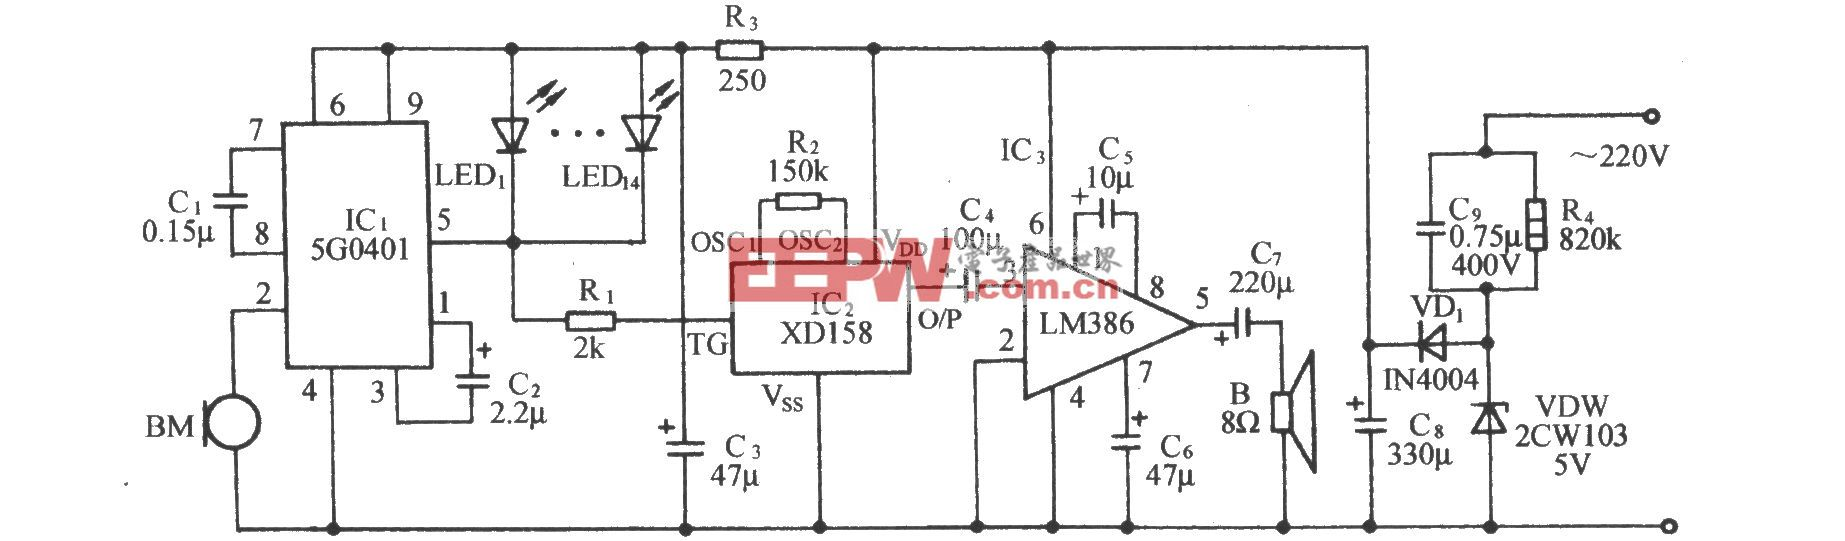 5G0401声控同步闪光伴迪斯科鼓点乐电路